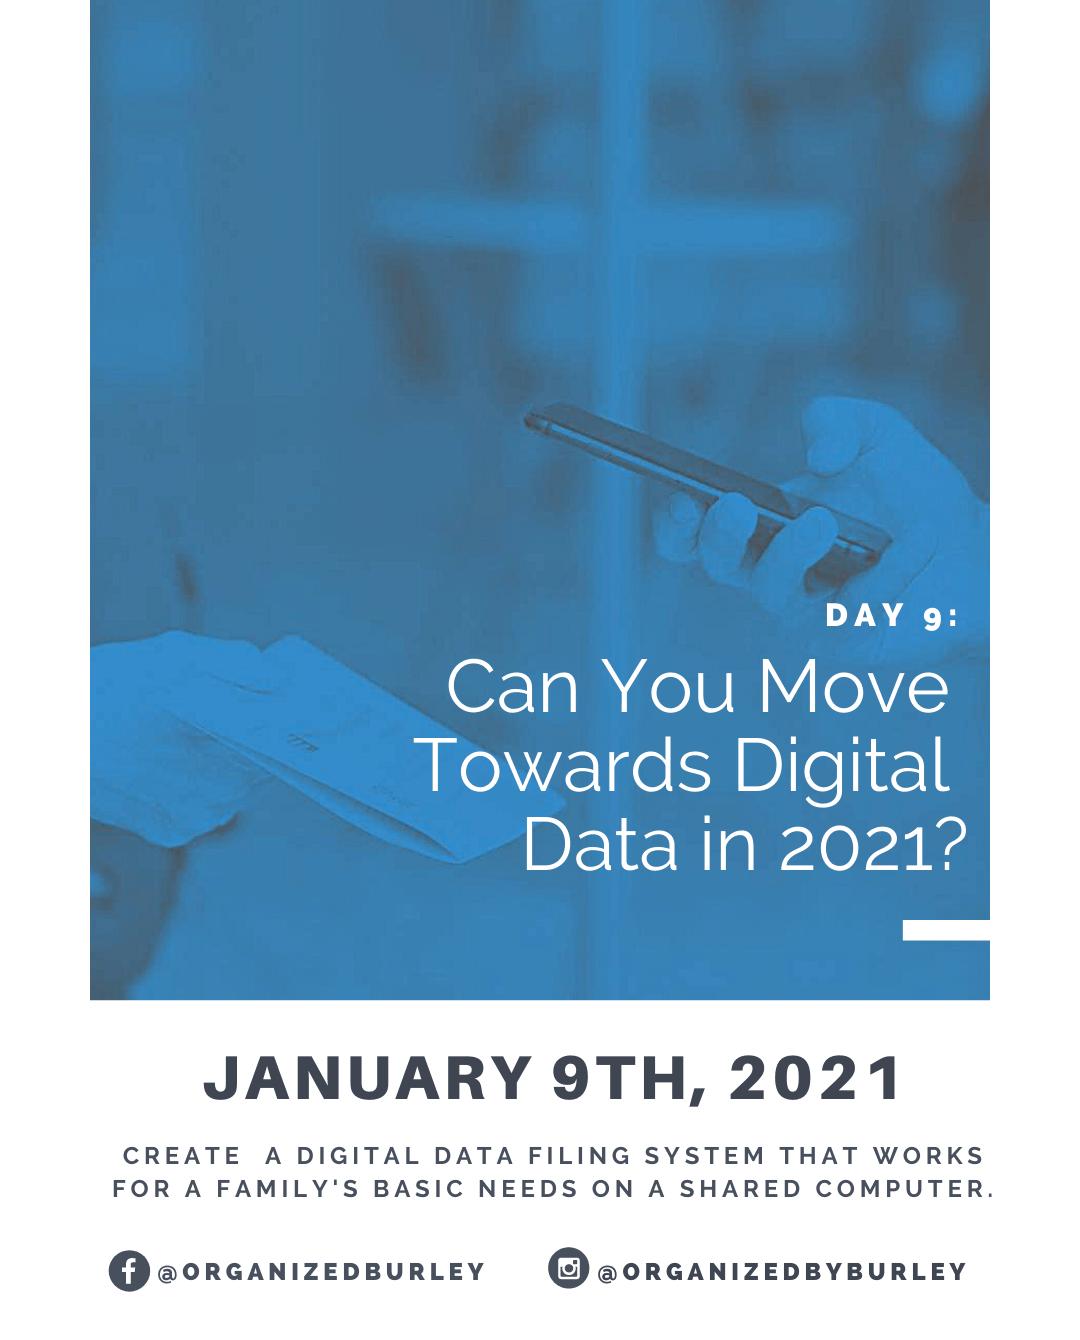 Transition your bills to digital